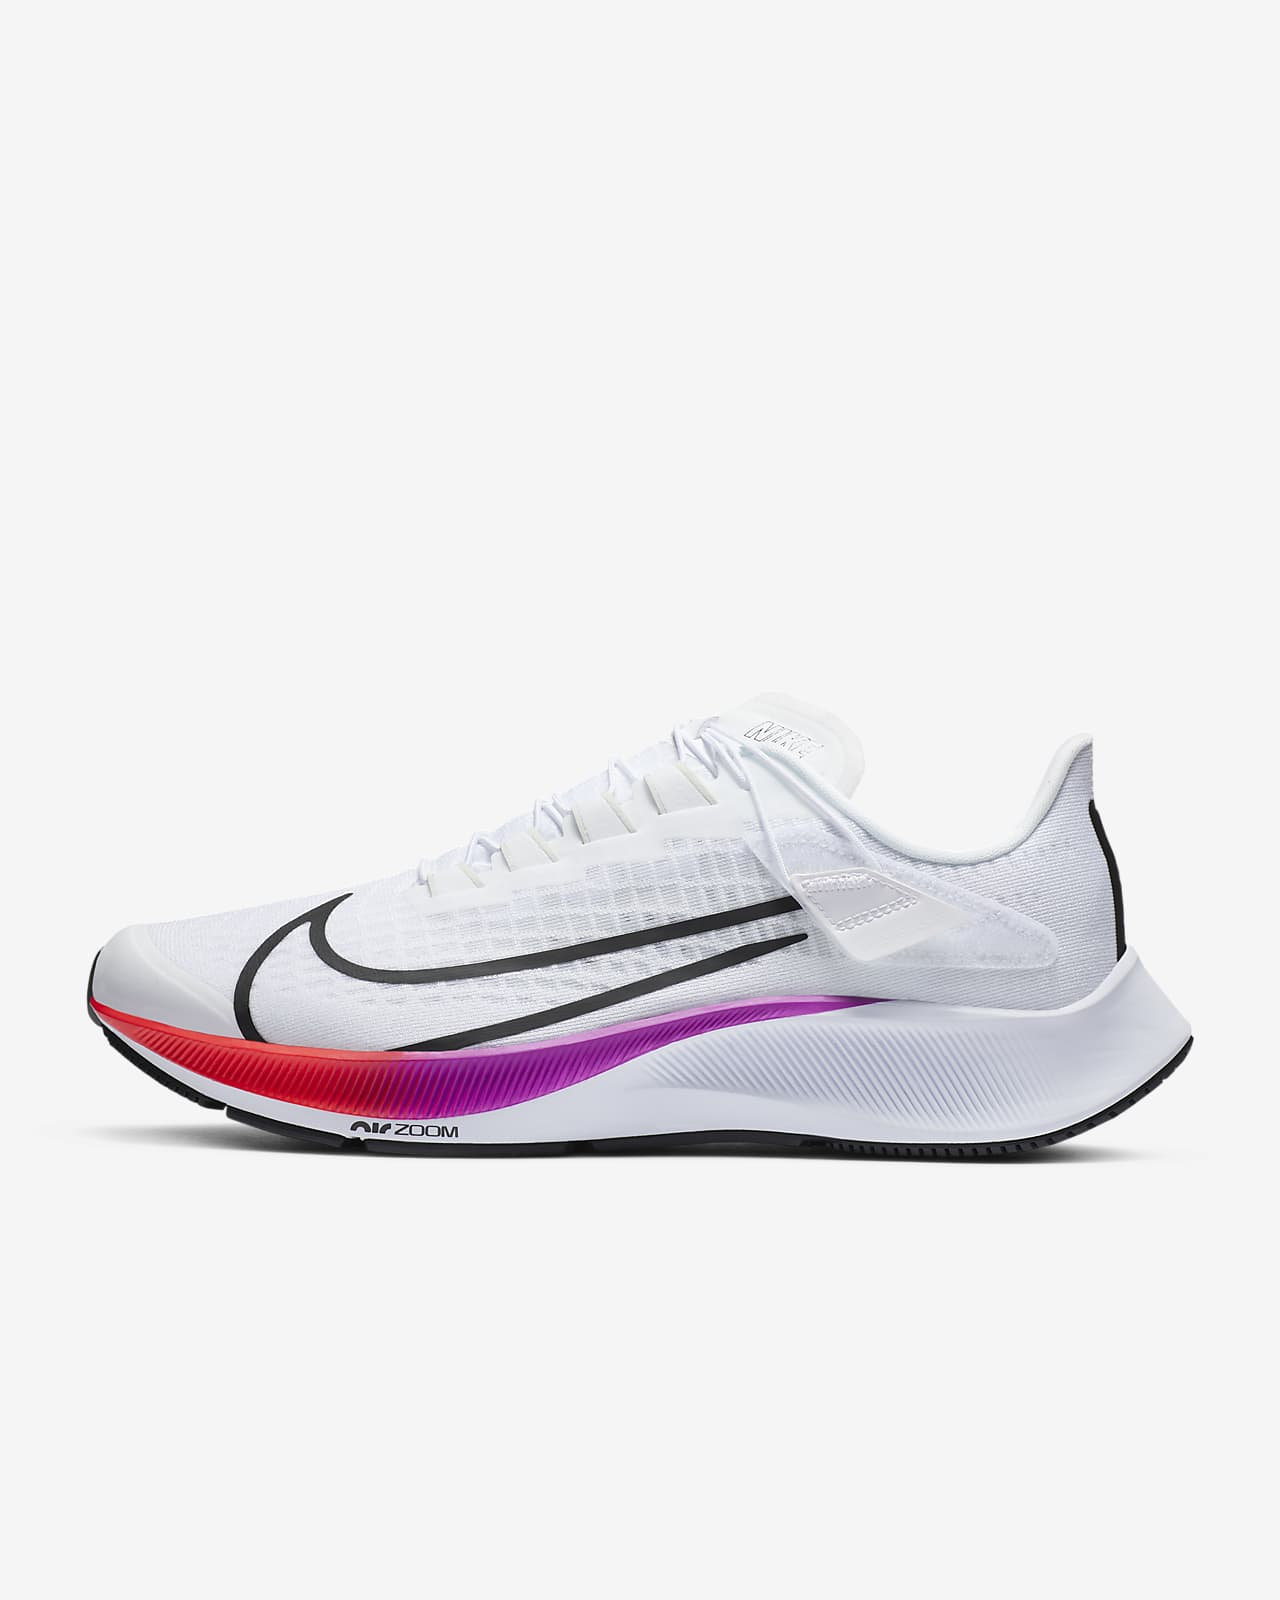 oferta flahs zapatillas nike hombre running